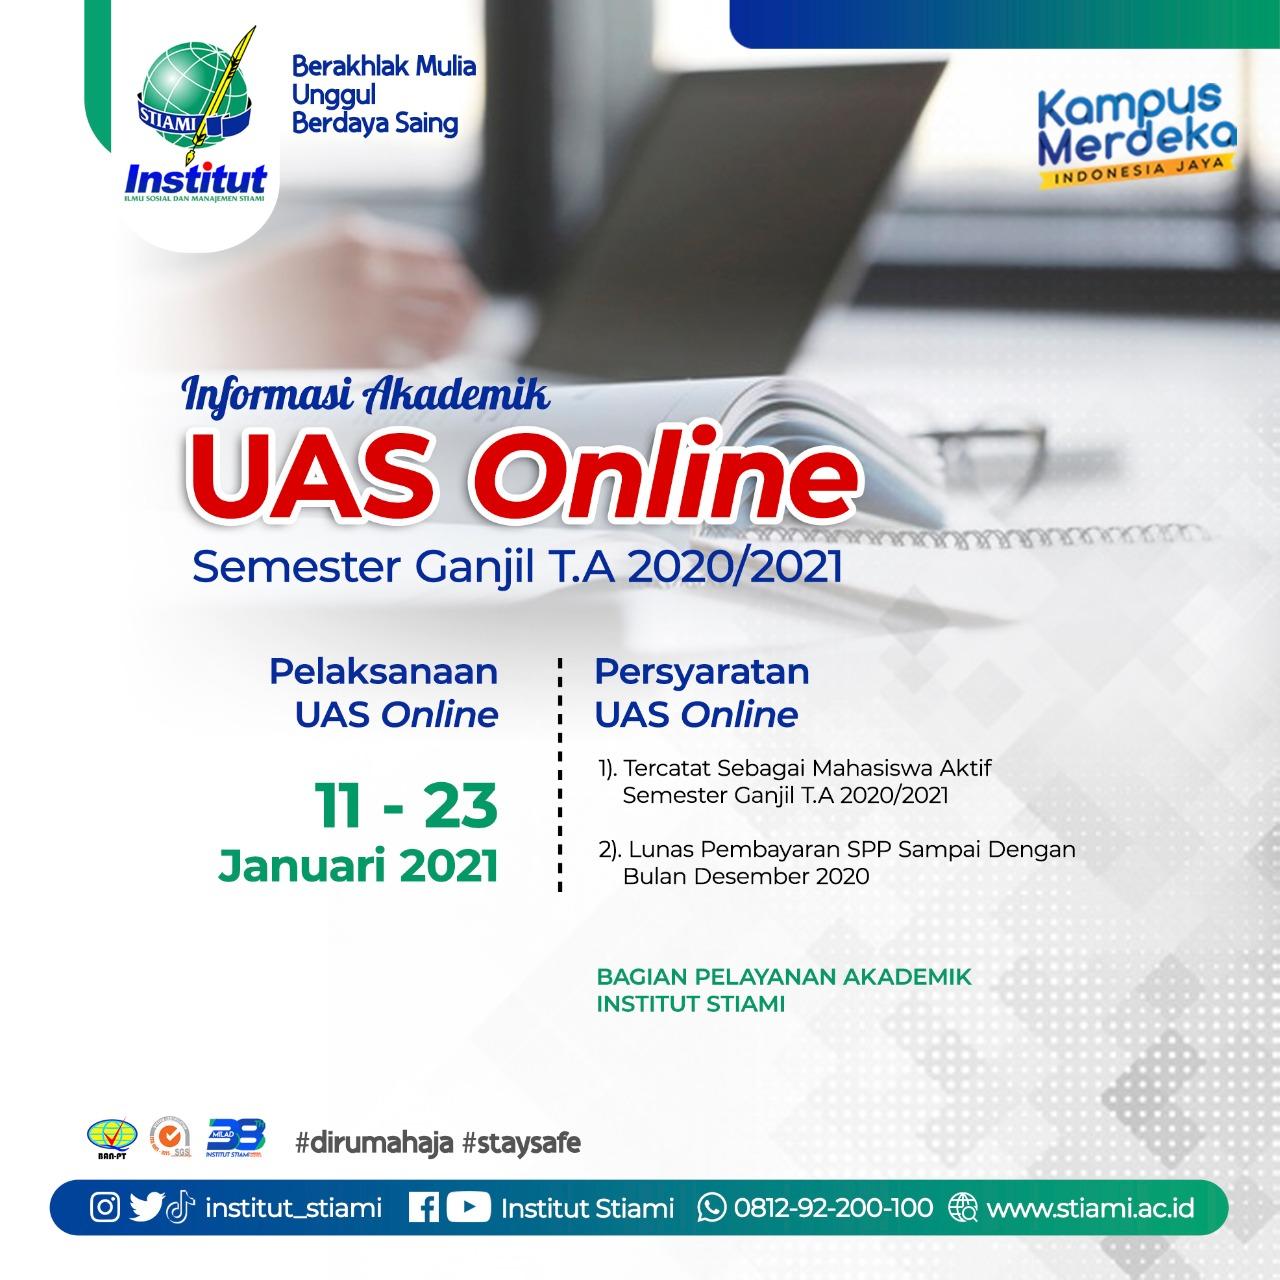 INFORMASI UAS ONLINE SEMESTER GANJIL TA 2020/2021